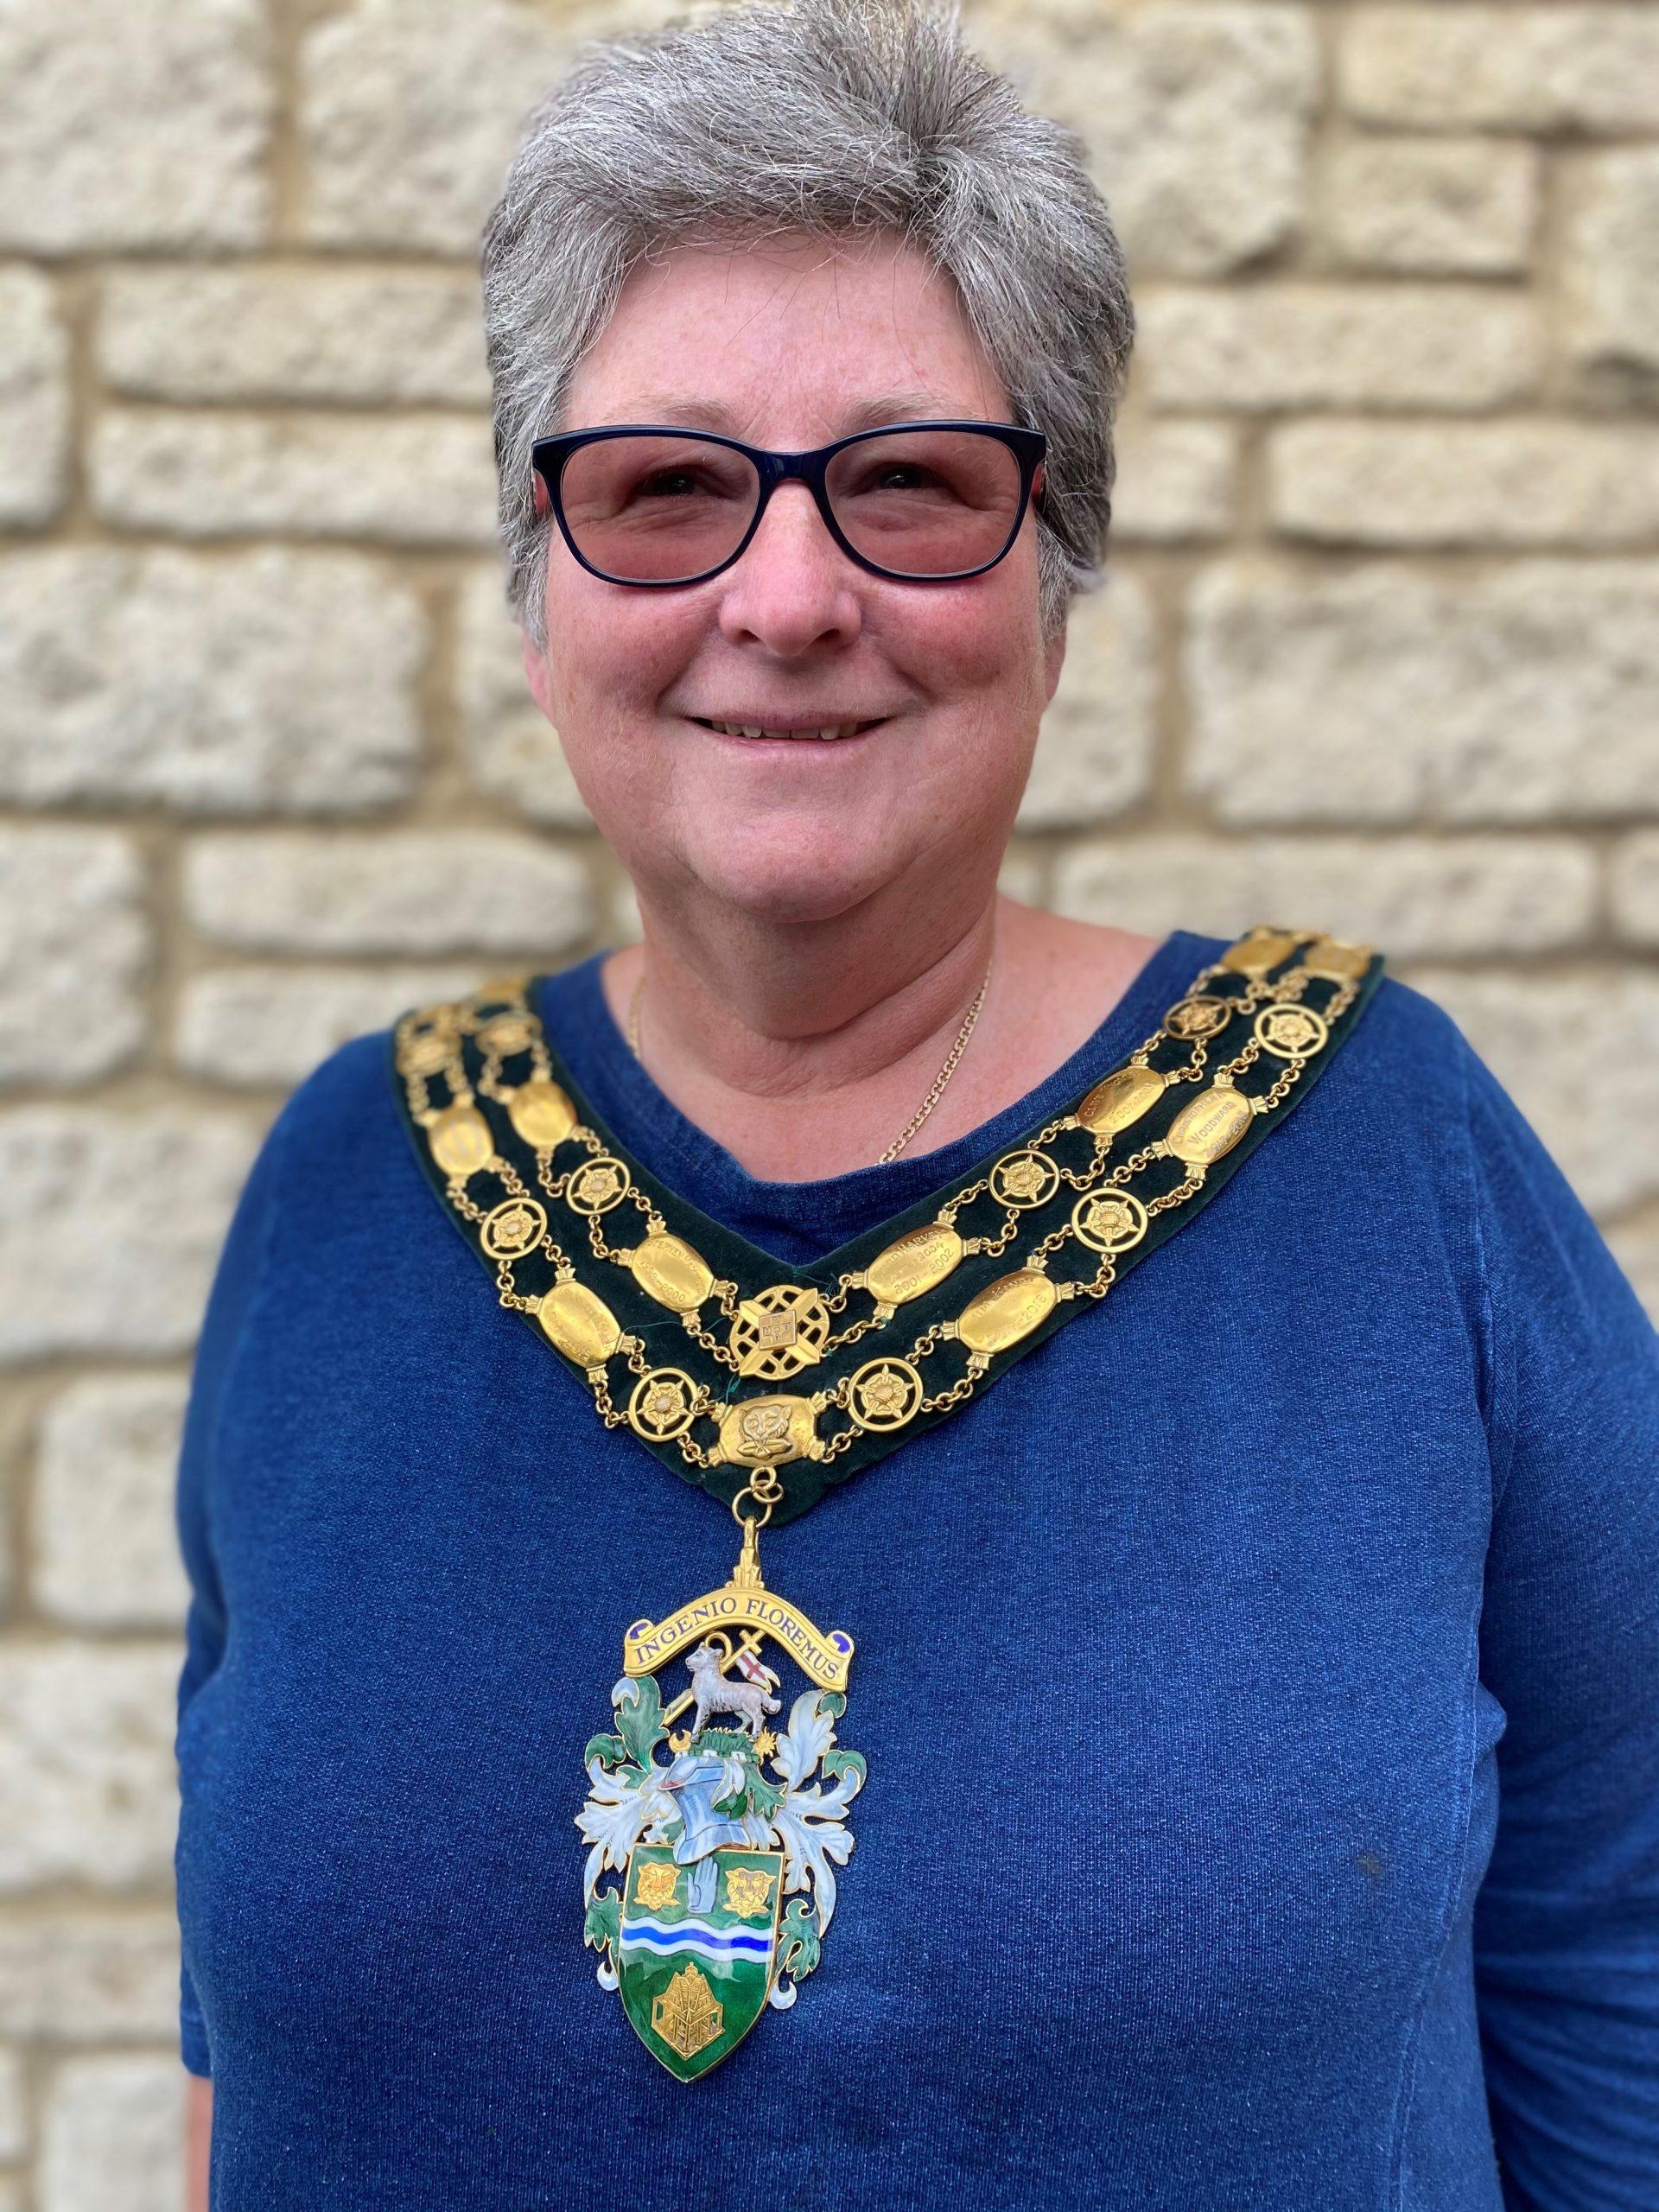 Mayor Councillor Joy Aitman